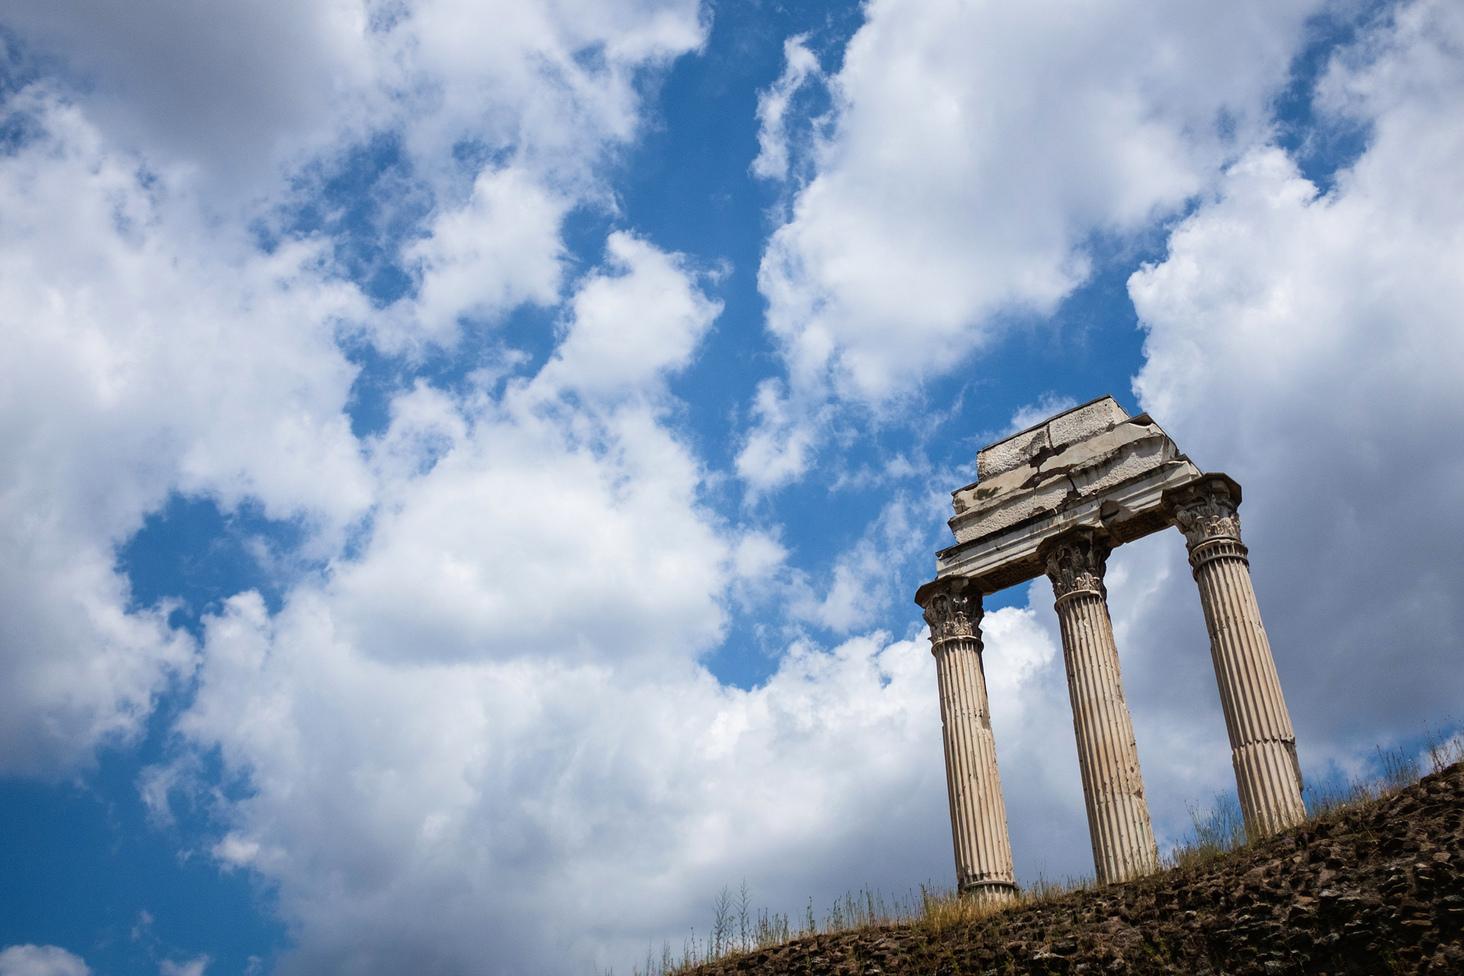 Antcient Rome's Columns